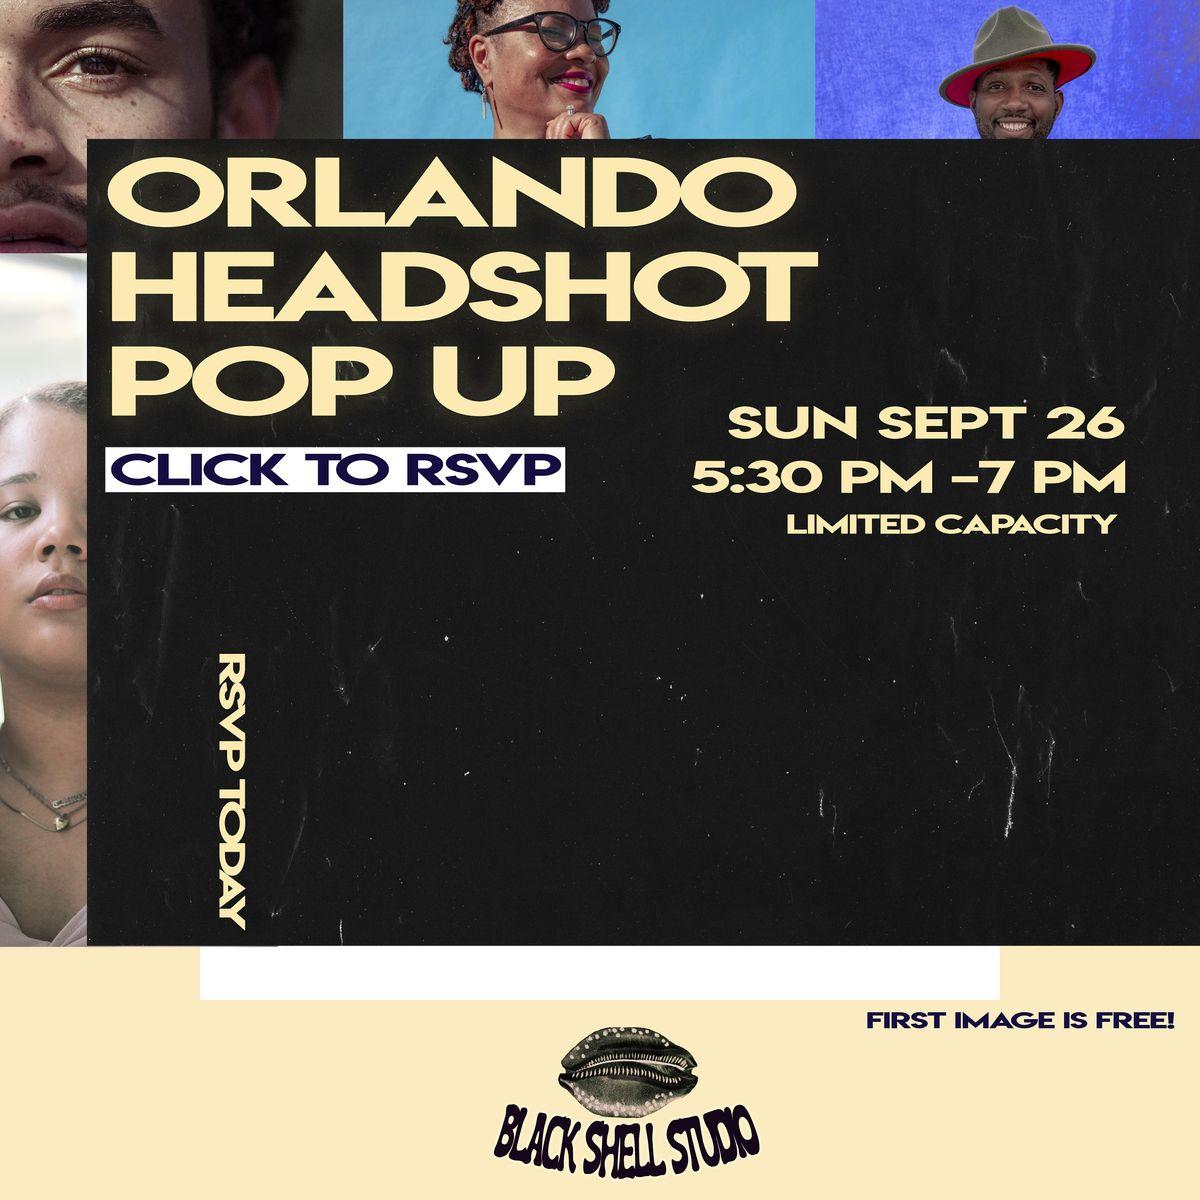 Headshot Pop-Up (Orlando)